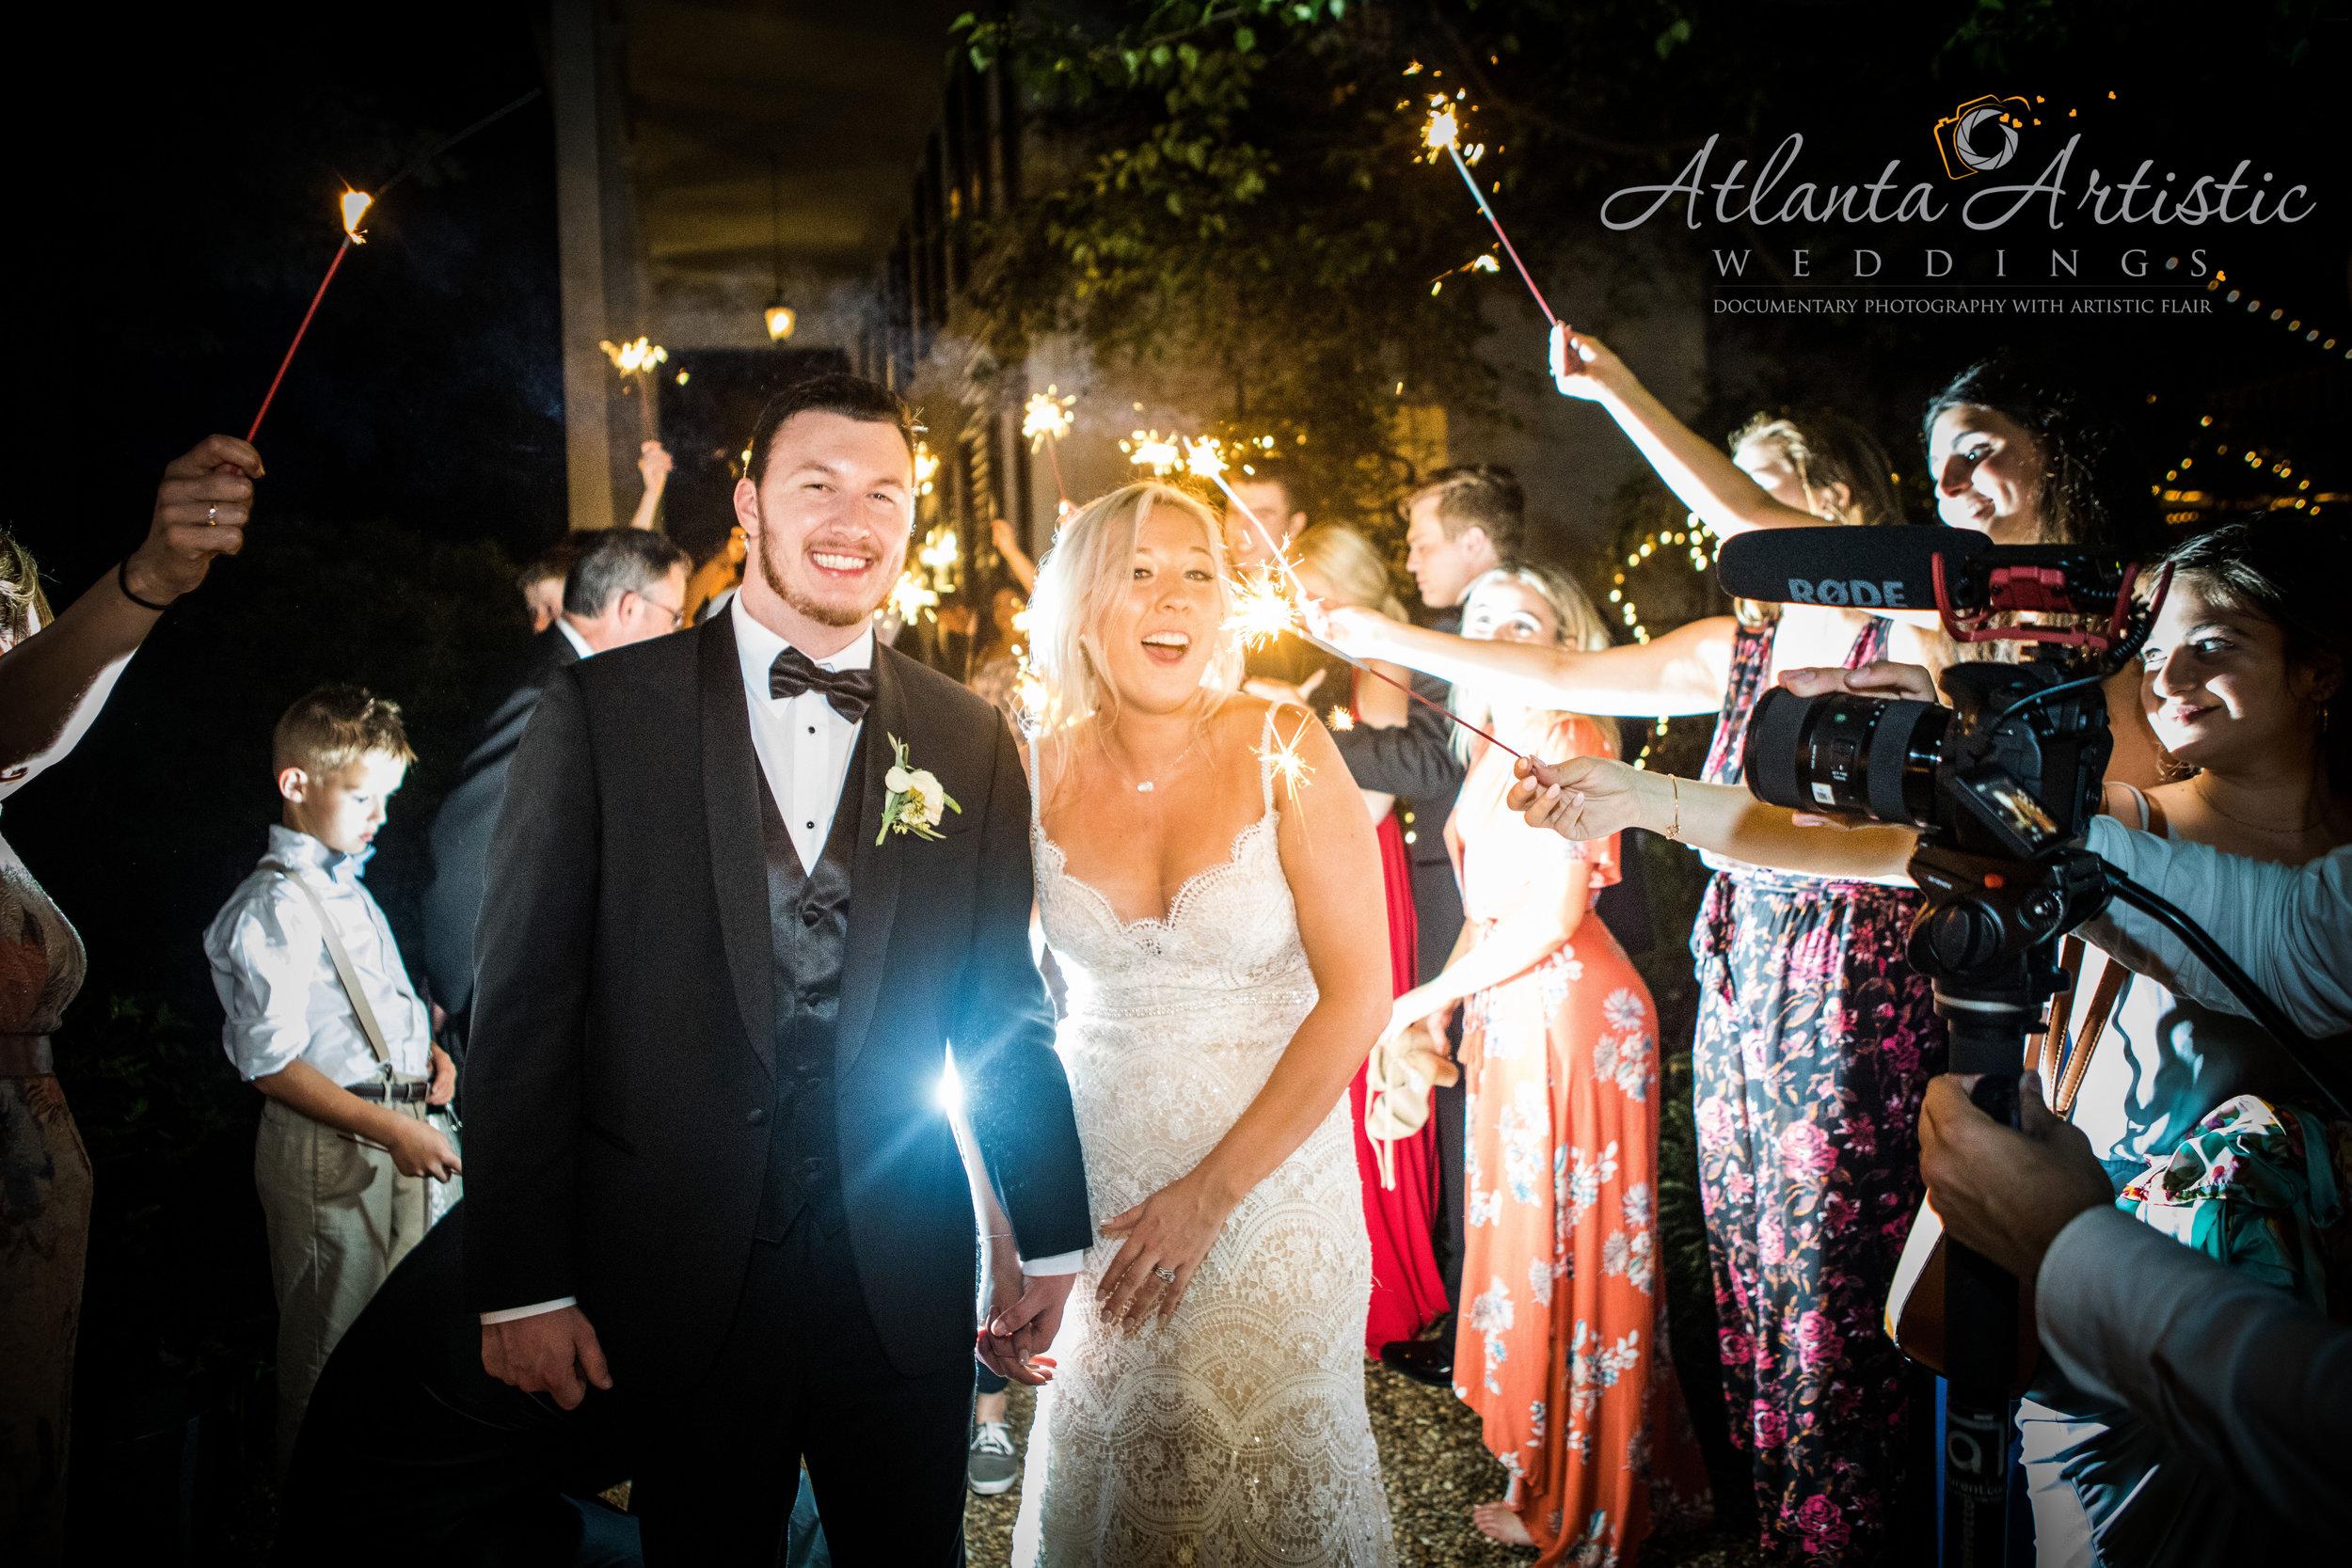 Photography by the Atlanta Wedding Photographers at www.AtlantaArtisticWeddings.com